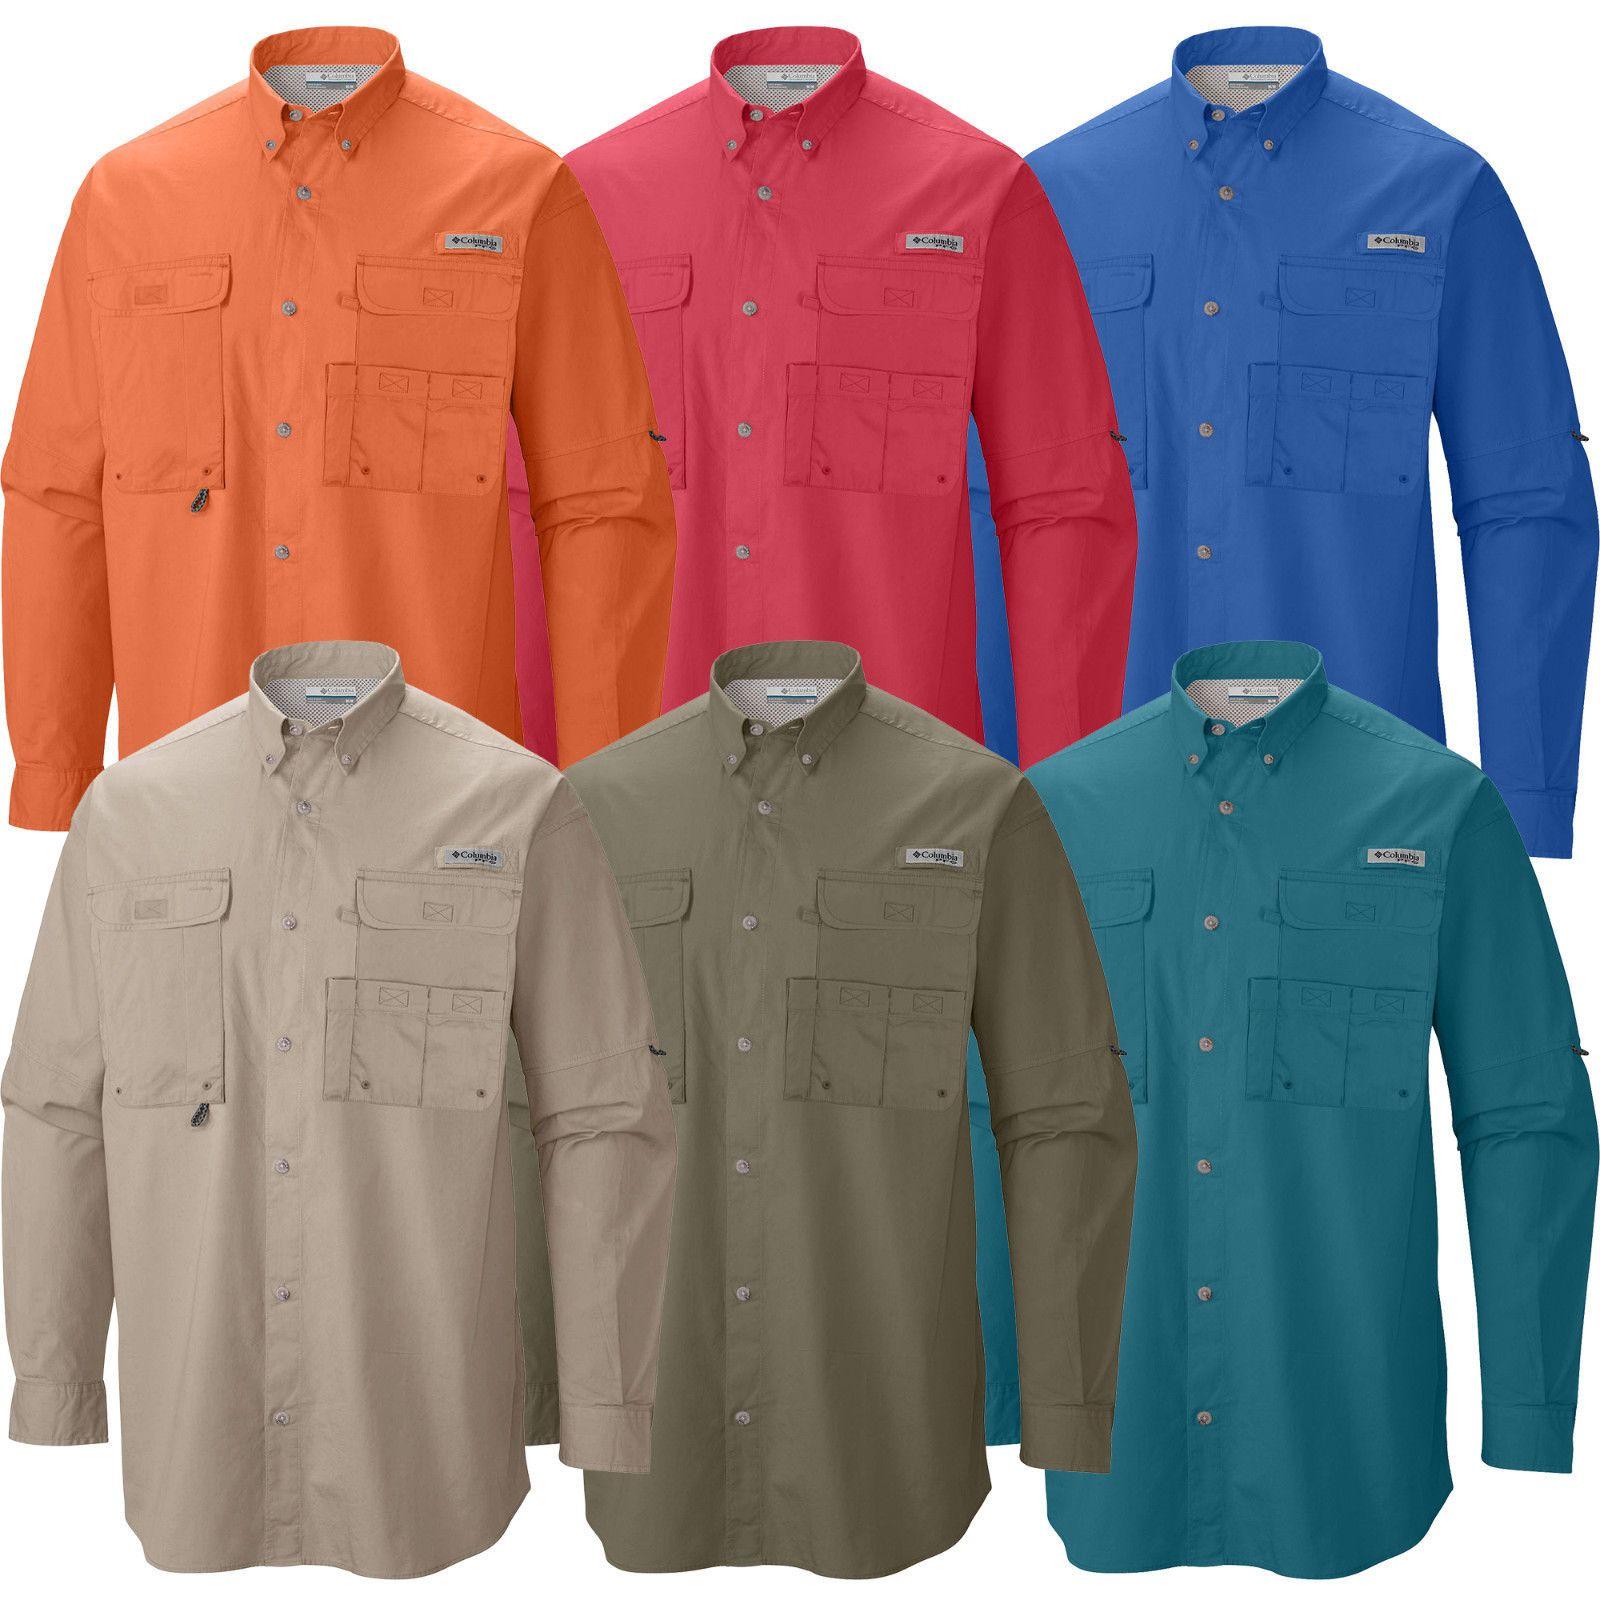 213a4941b39d16 Columbia Womens Bonehead Short Sleeve Fishing Shirt - Cotswold Hire